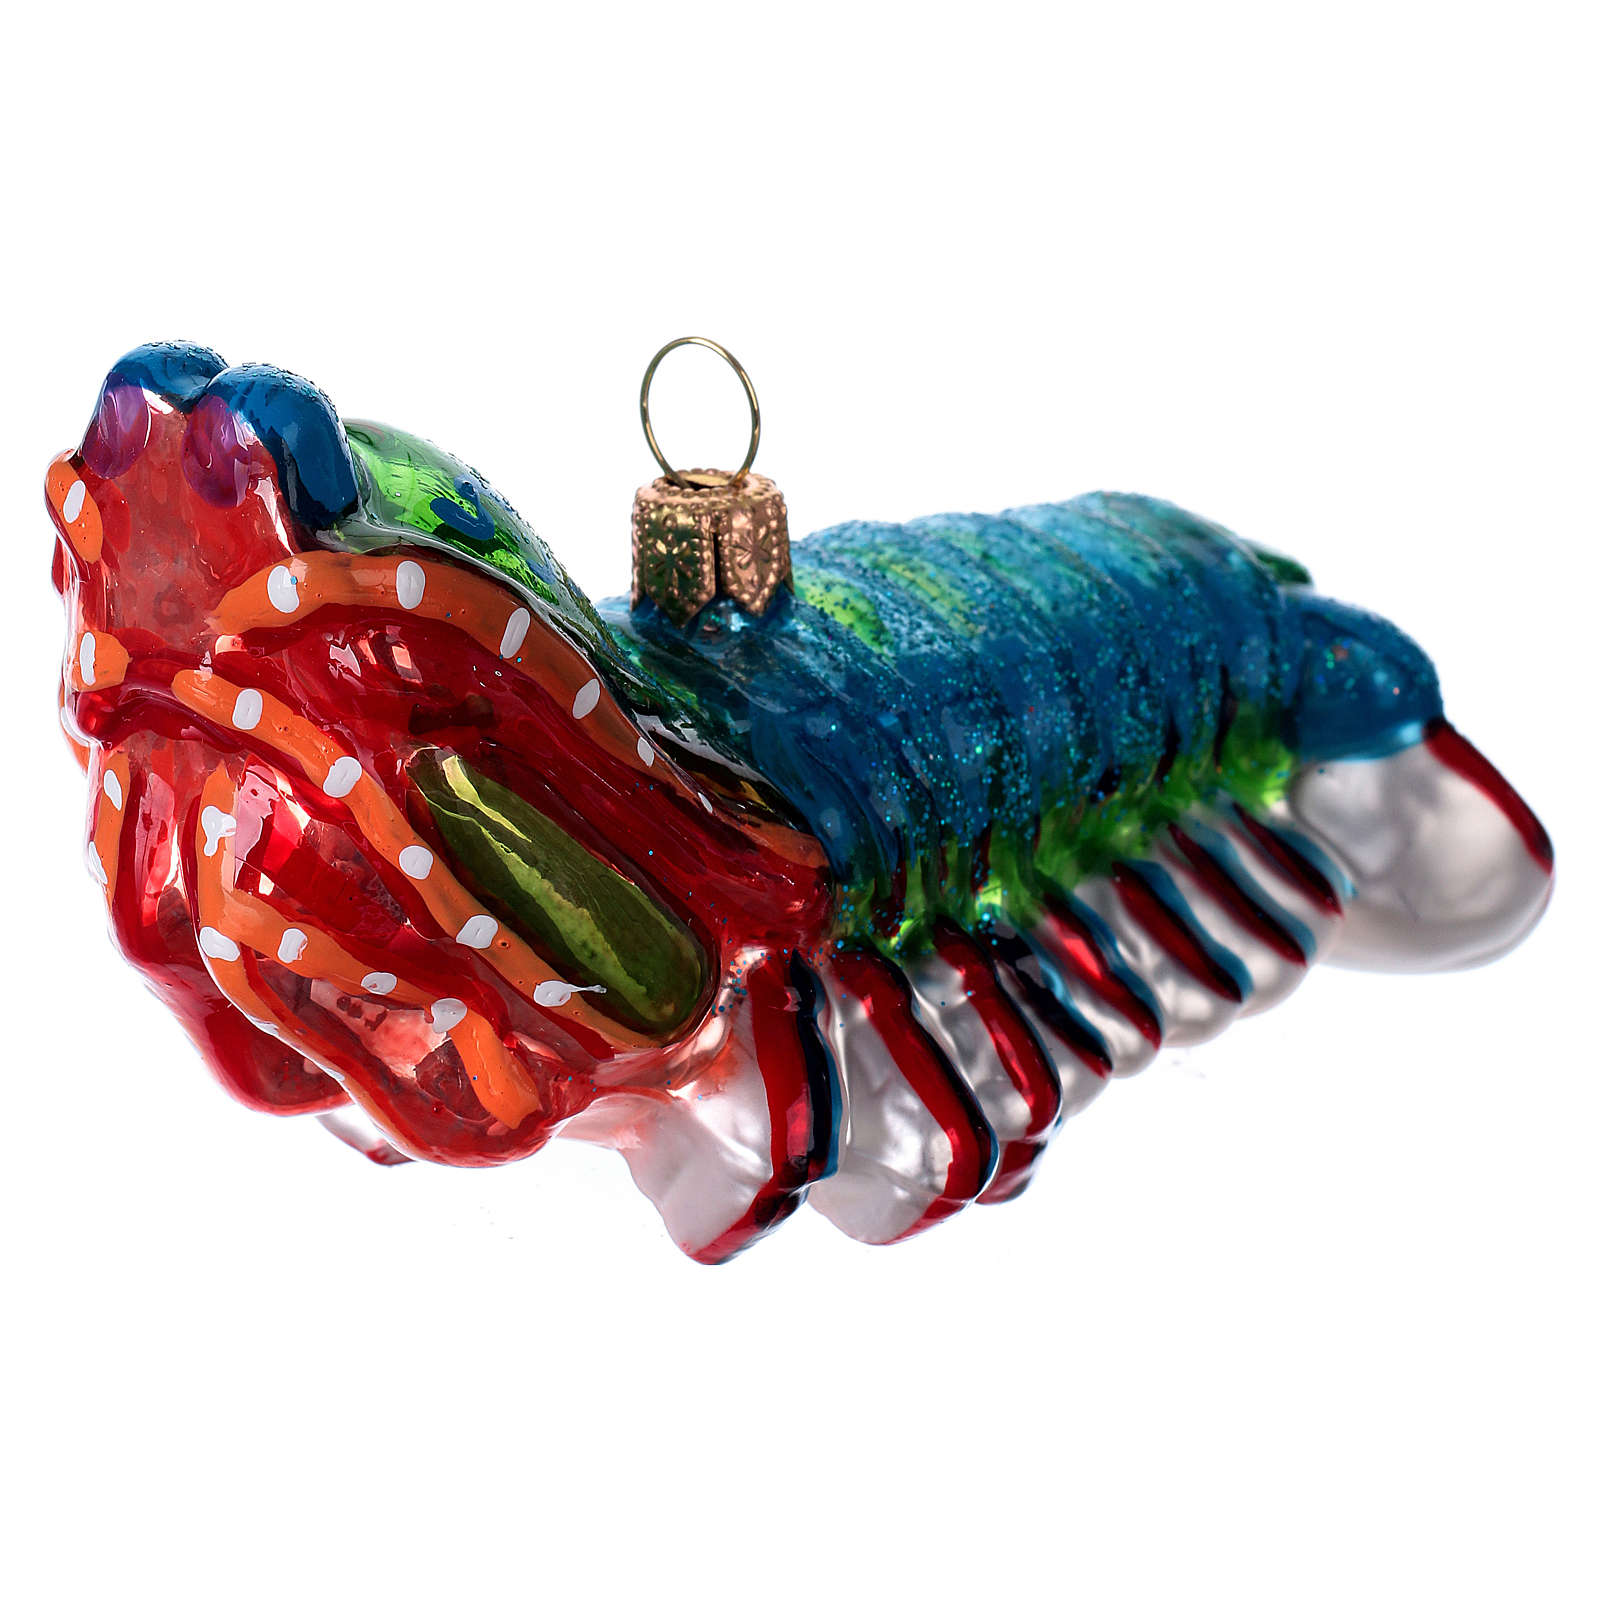 Blown glass Christmas ornament, peacock mantis shrimp 4